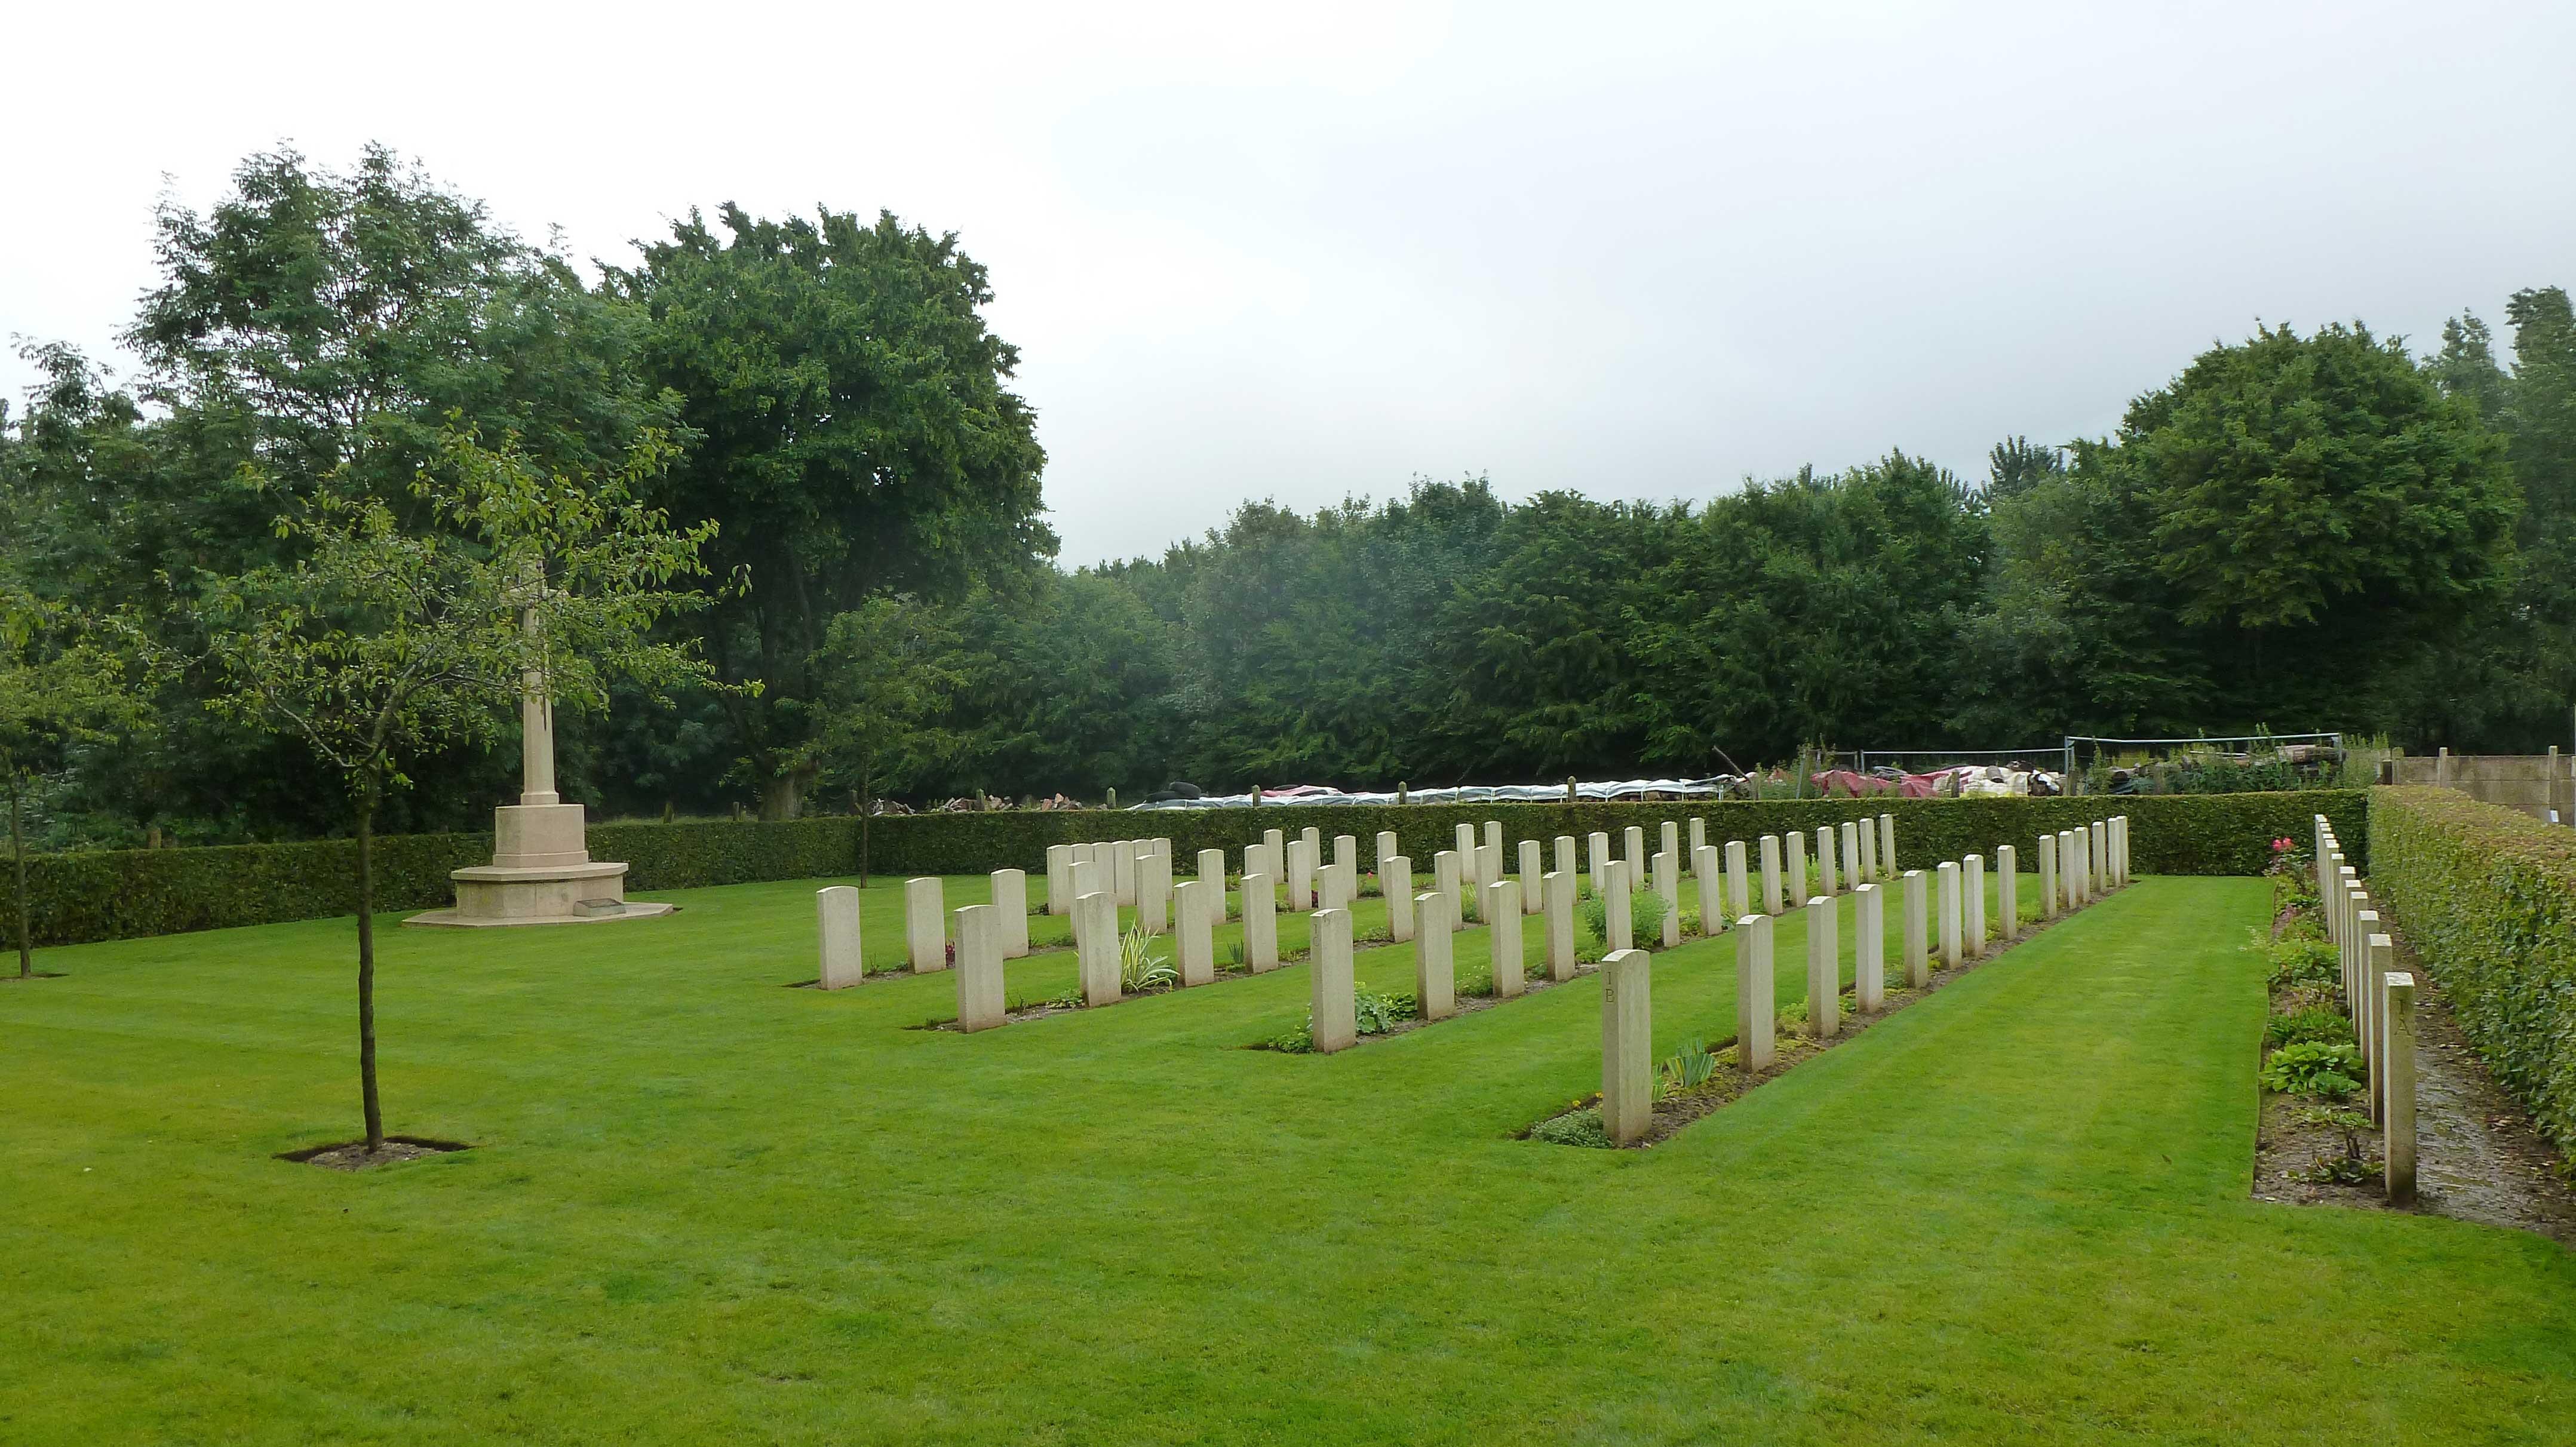 James-Poyser-Cemetery